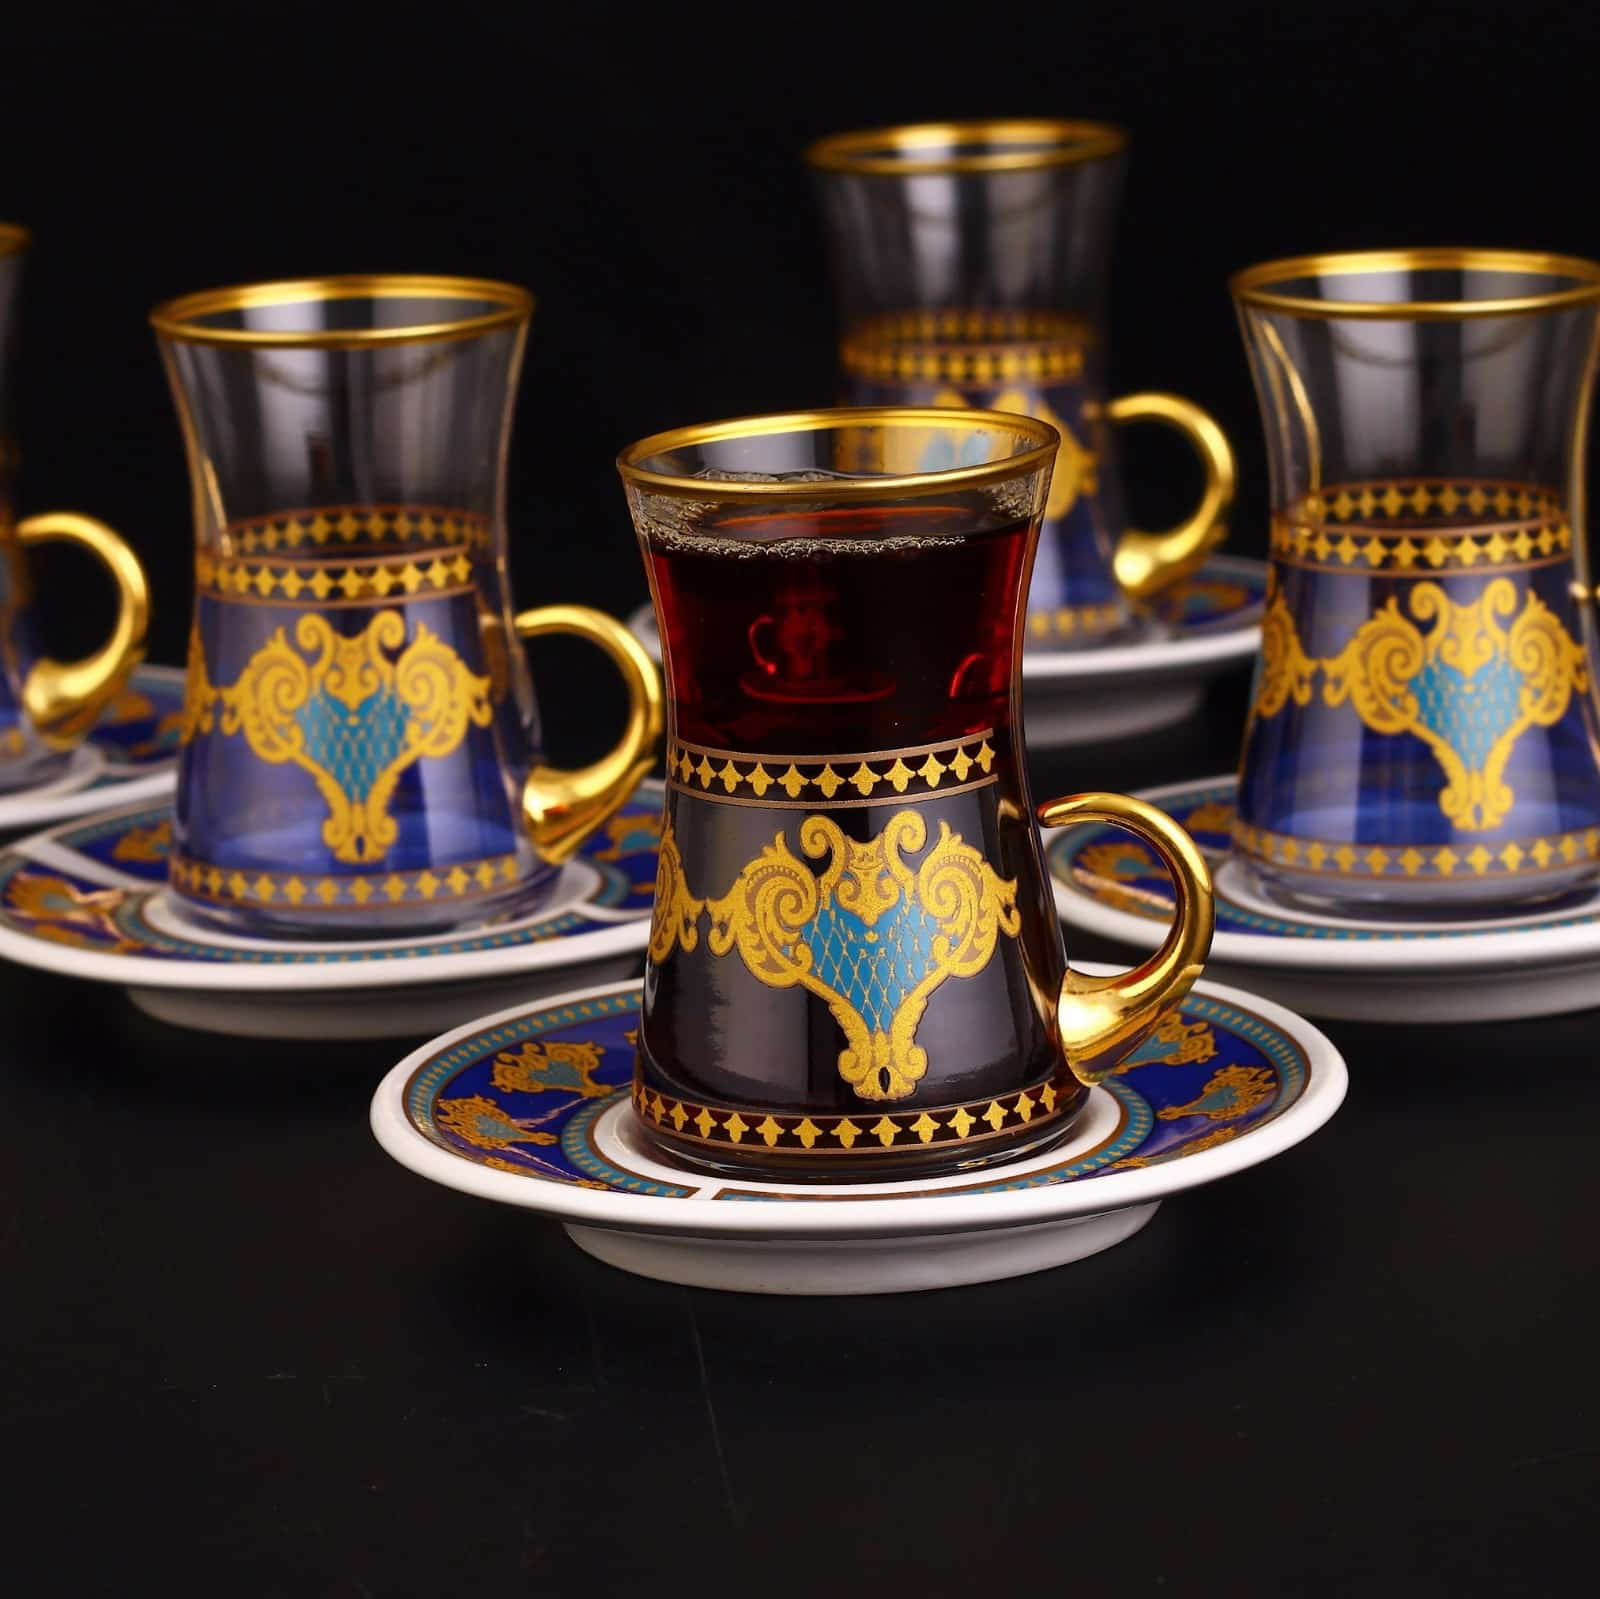 Authentic Turkish Tea Set With Holder Porcelain Saucers